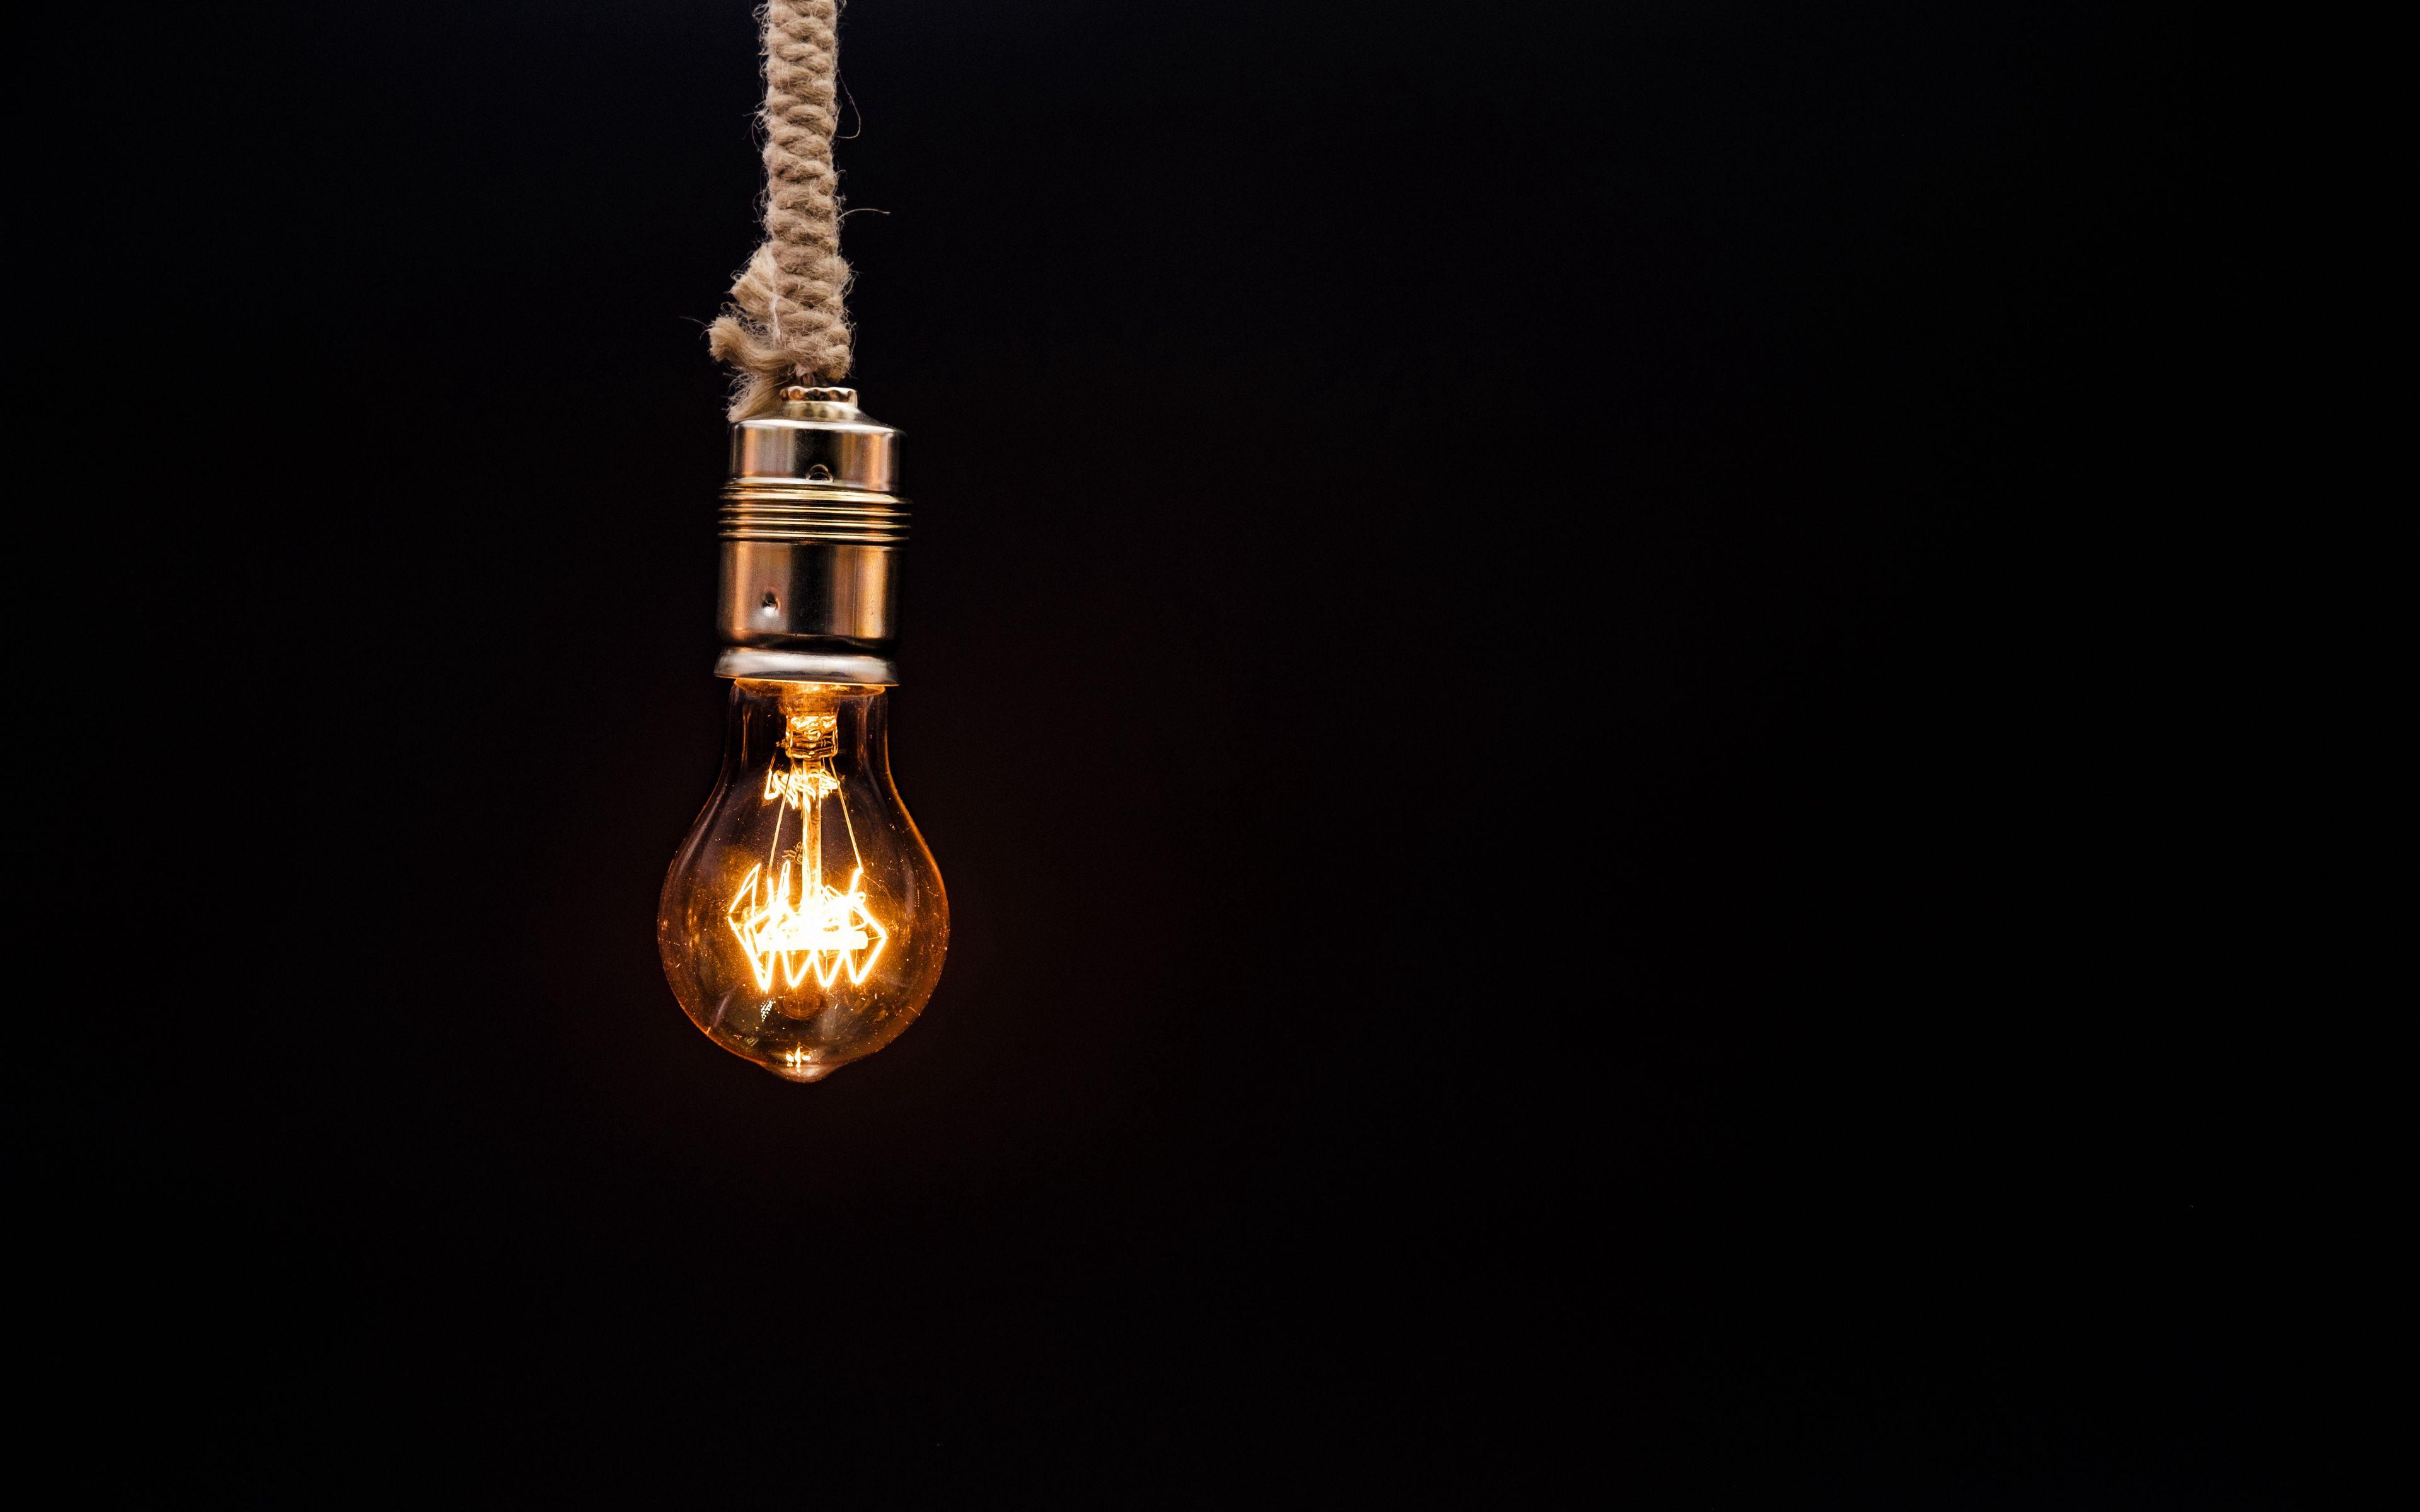 3840x2400 Wallpaper bulb, lighting, rope, electricity, edisons lamp